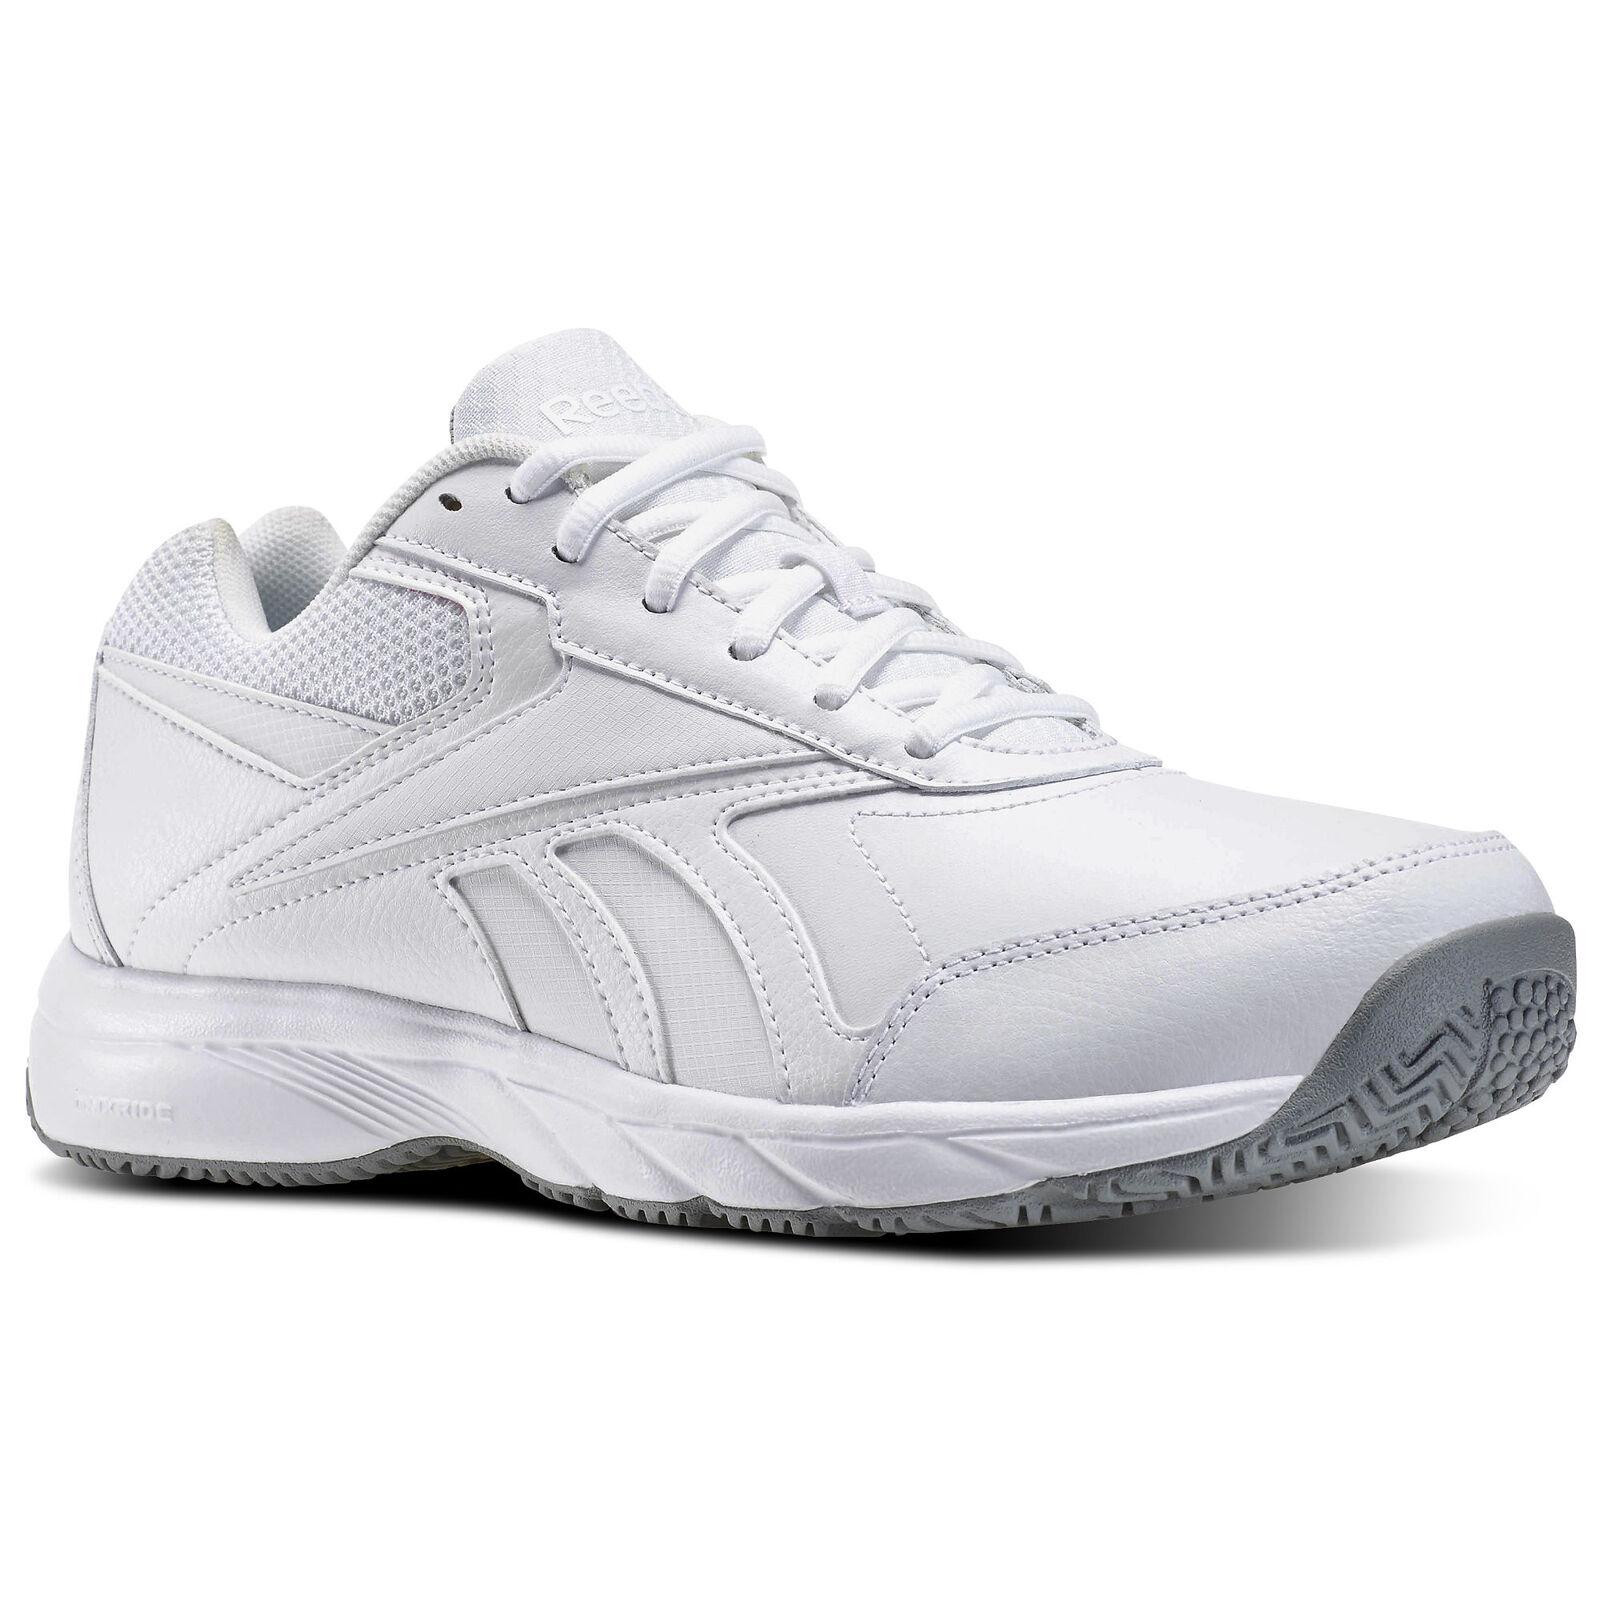 50f976baf33ce 2018 Reebok Men s Work N 2.0 4E shoes US10 Cushion New ntpawh2816 ...